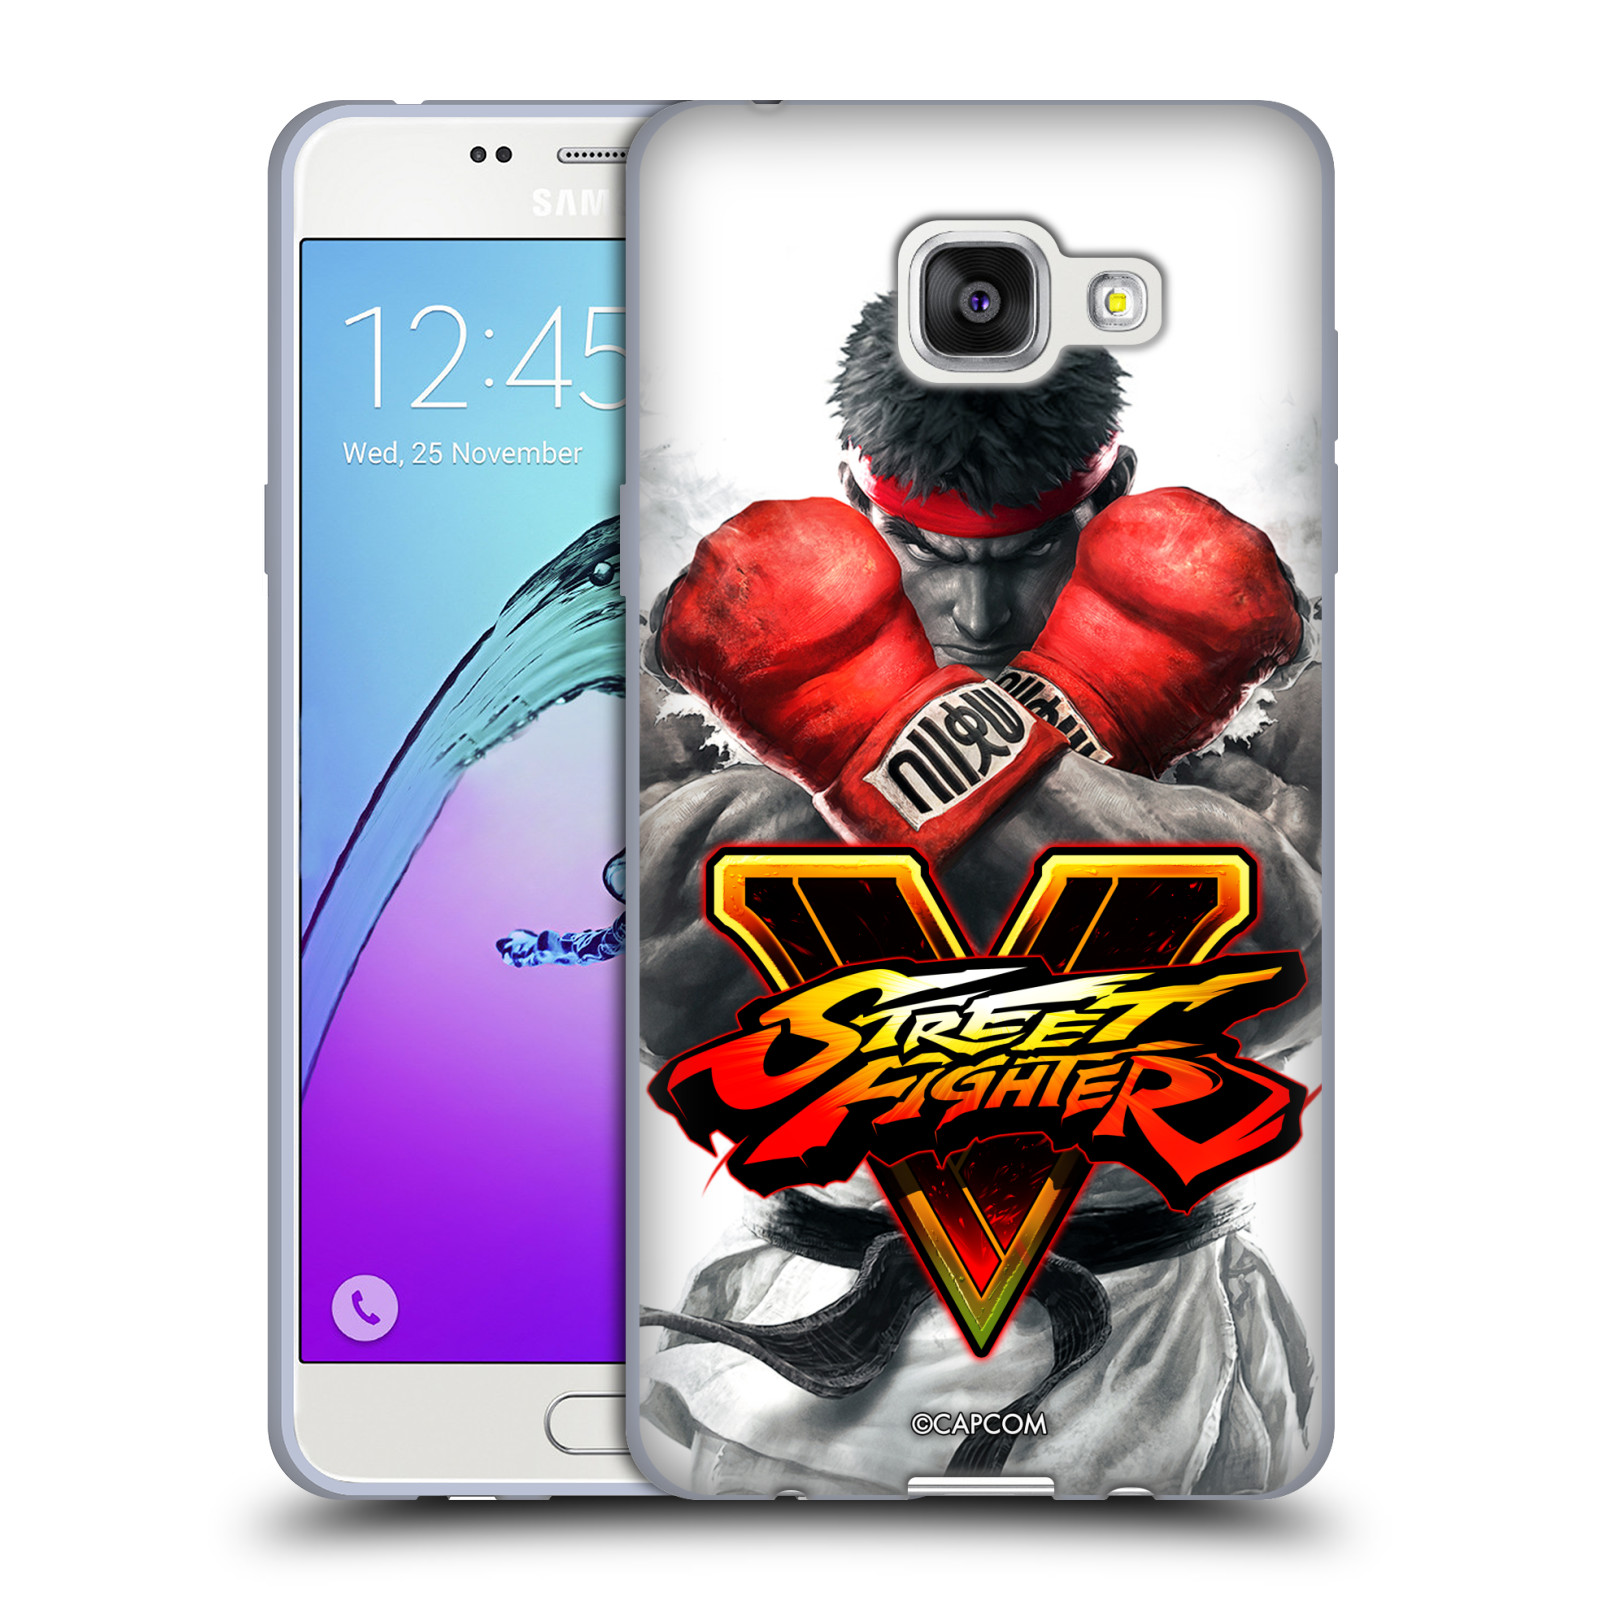 HEAD CASE silikonový obal na mobil Samsung Galaxy A5 2016 (A510) oficiální kryt STREET FIGHTER Boxer Ryu